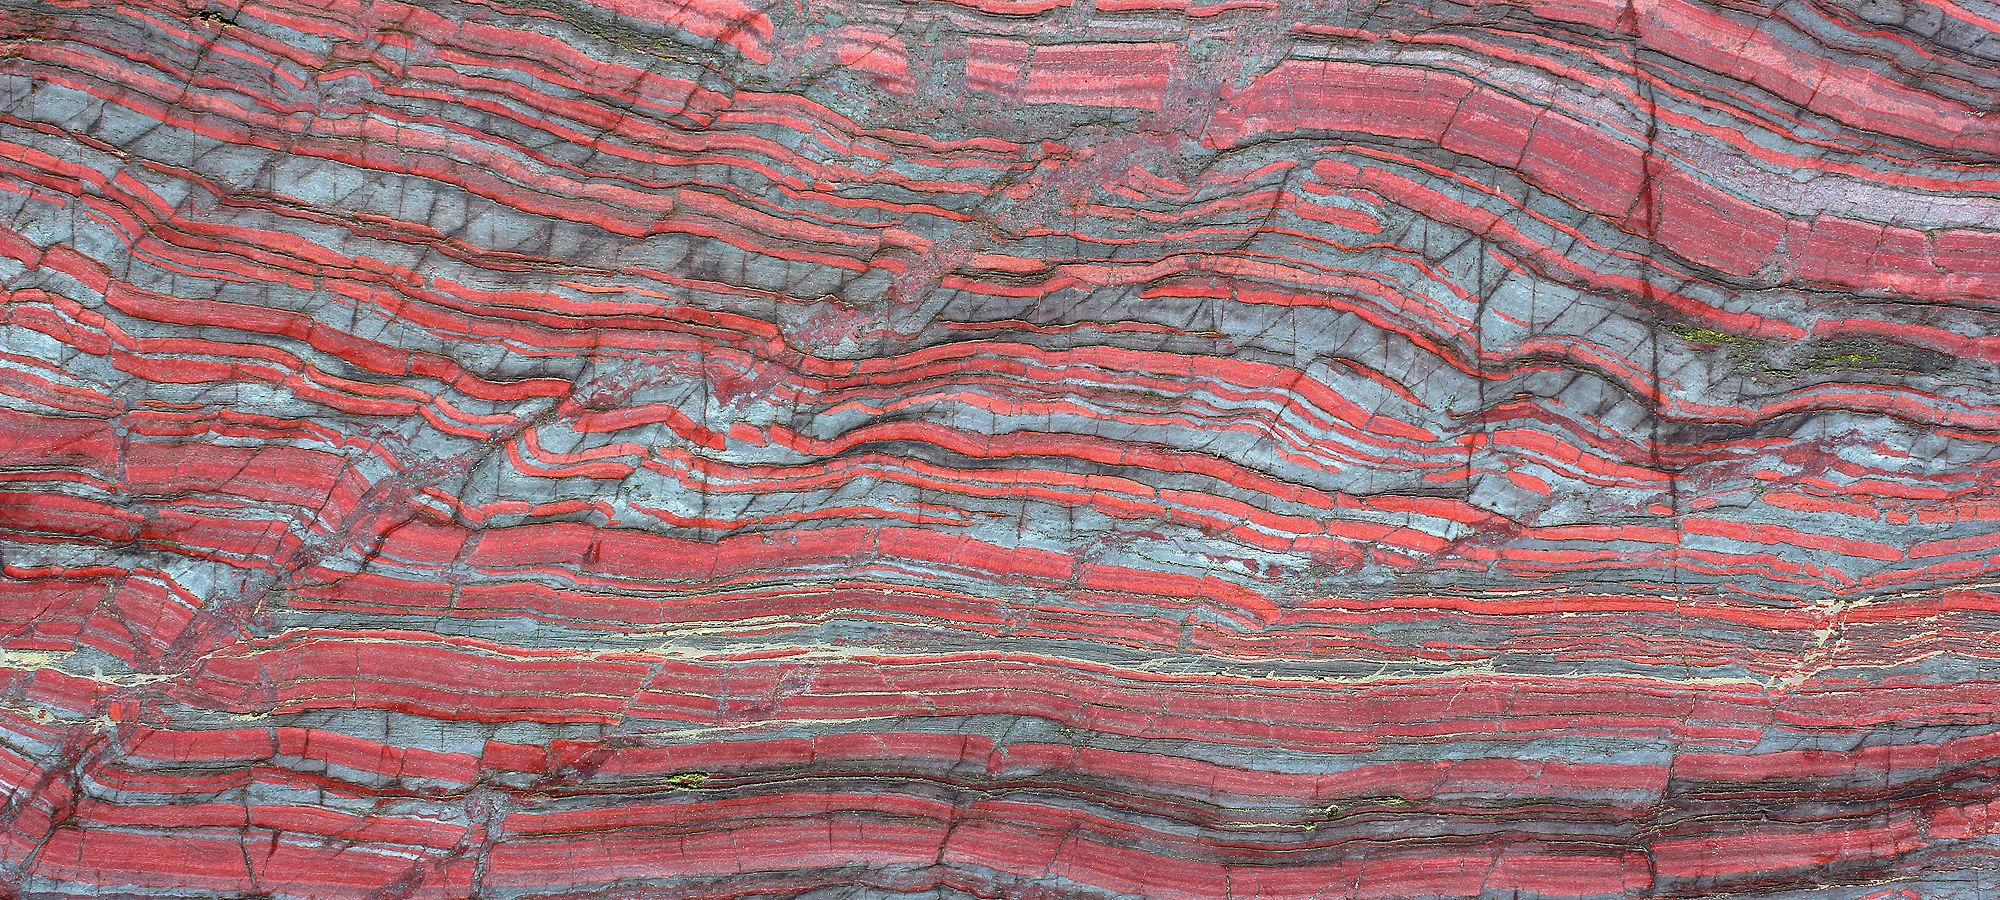 Pink striped stone